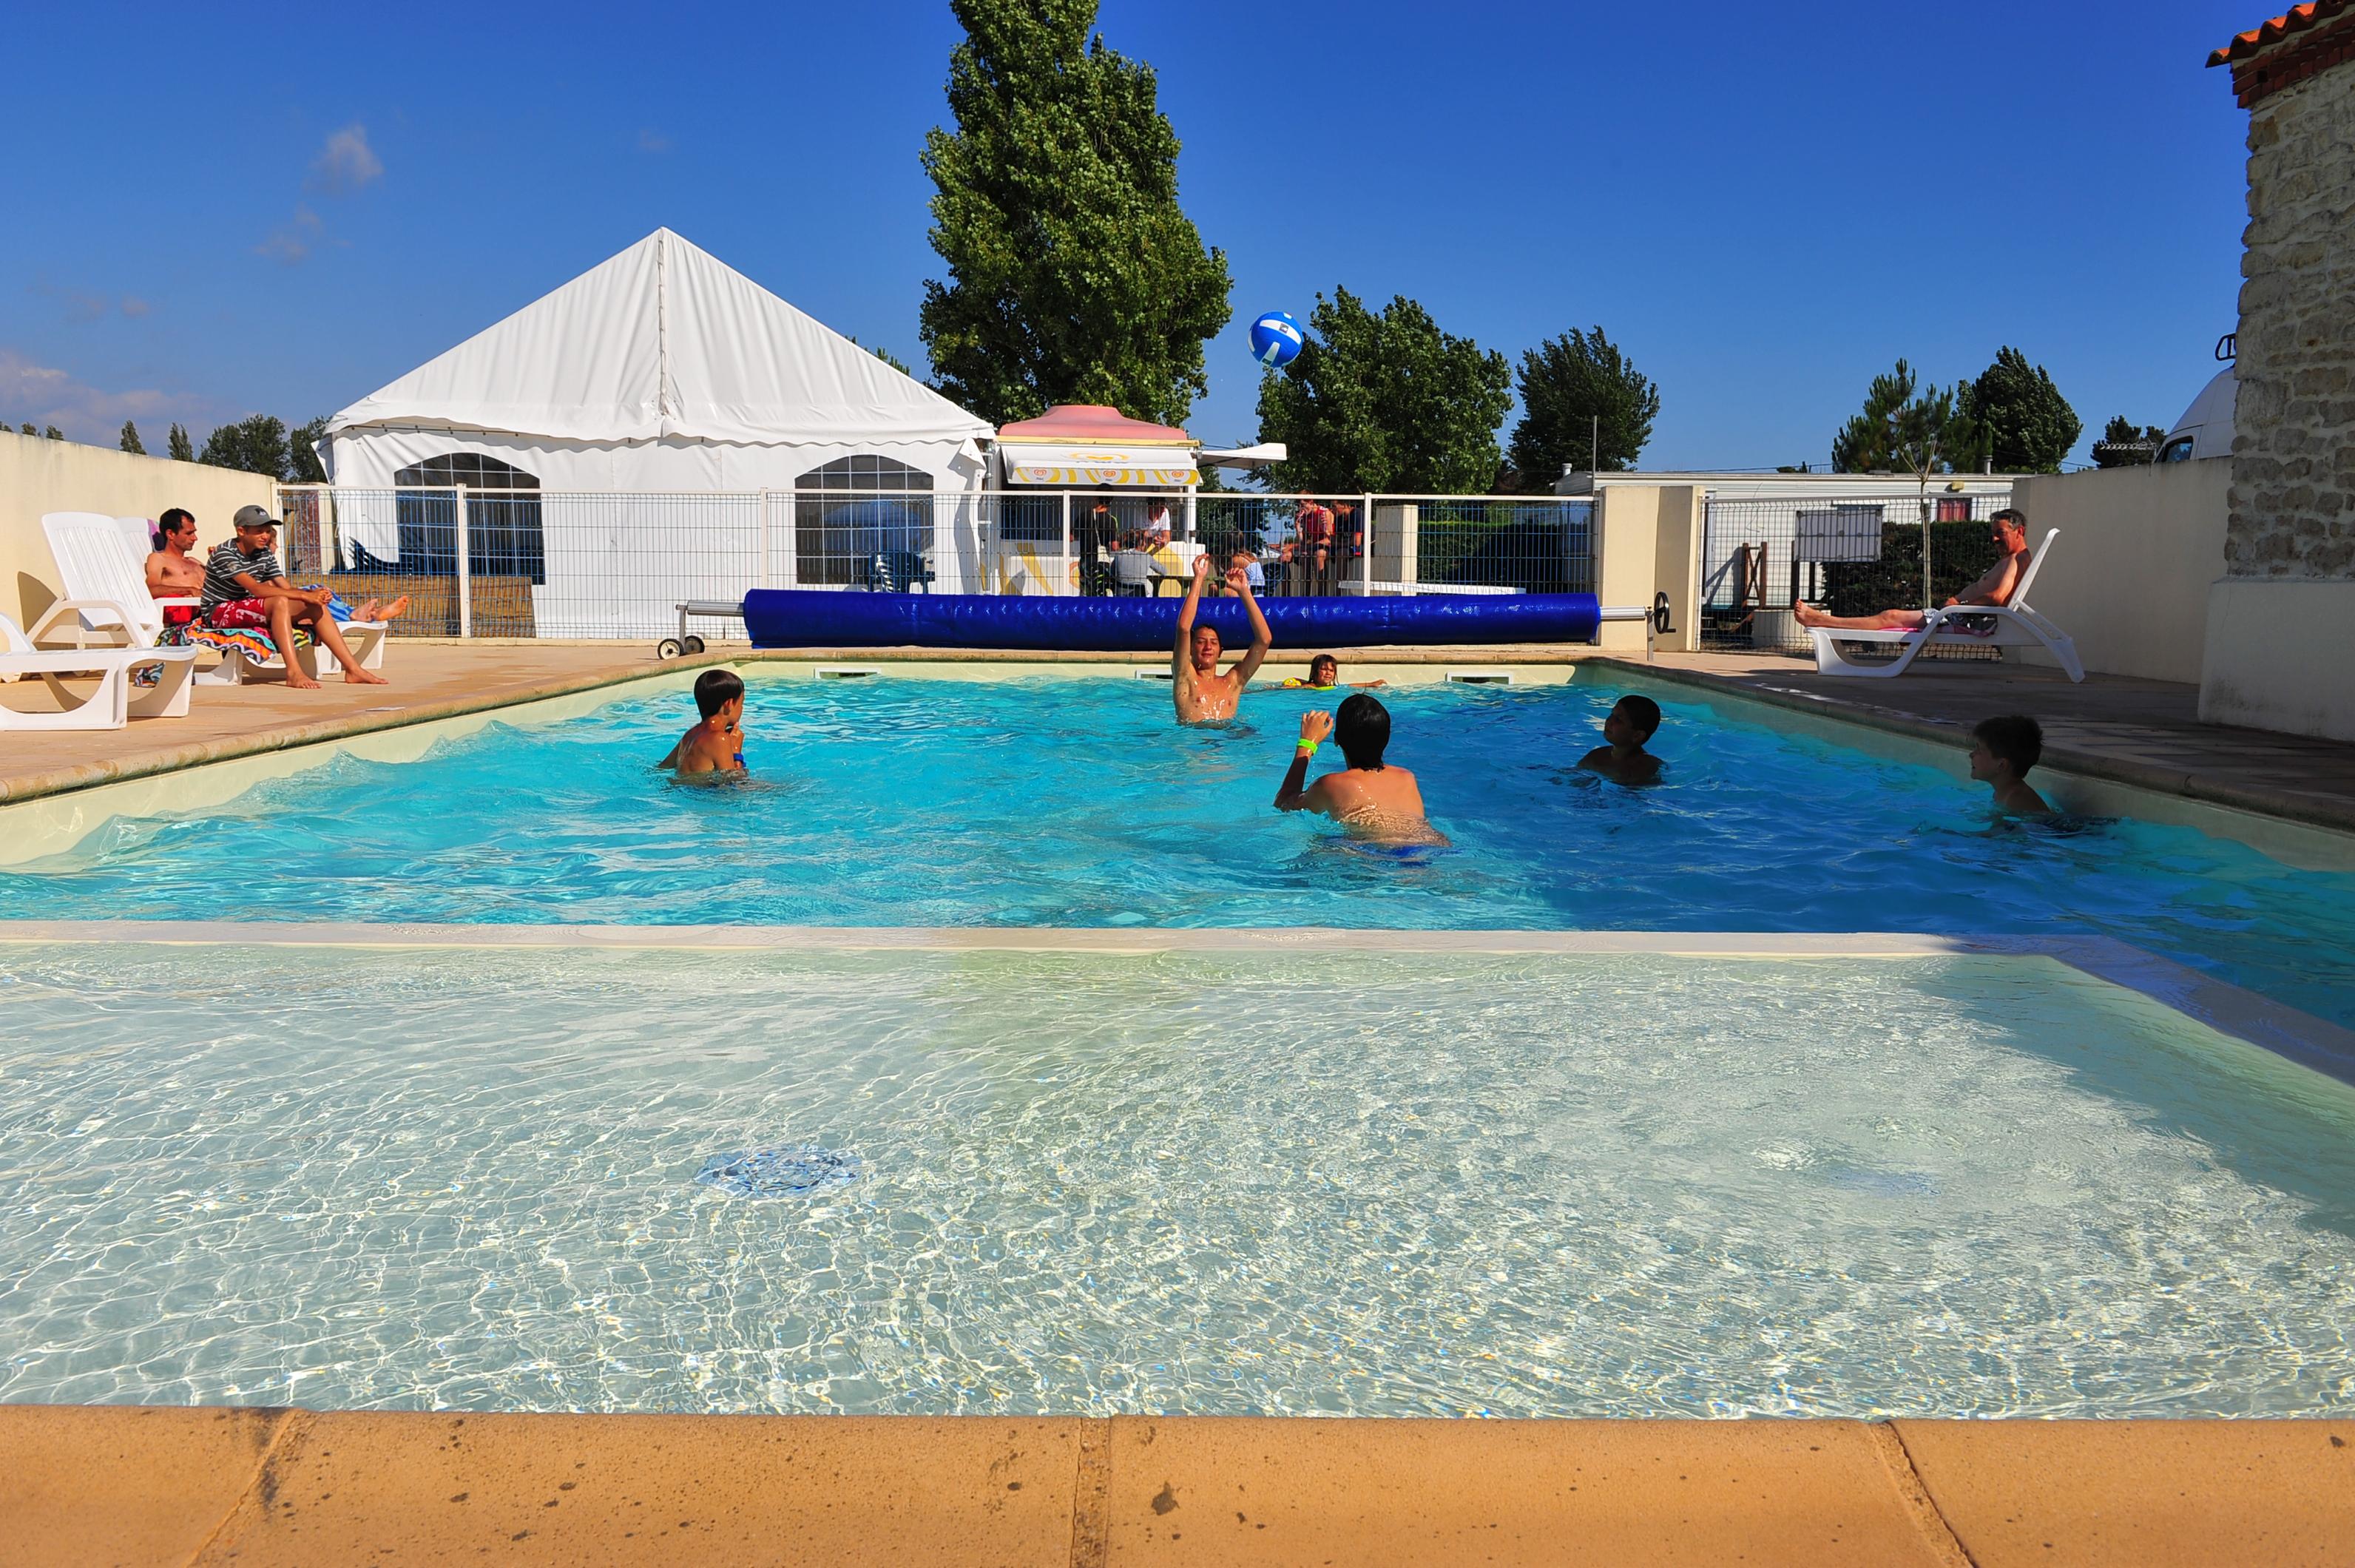 camping-pavillon-bleu-la faute-sur-mer-85-hpa-2